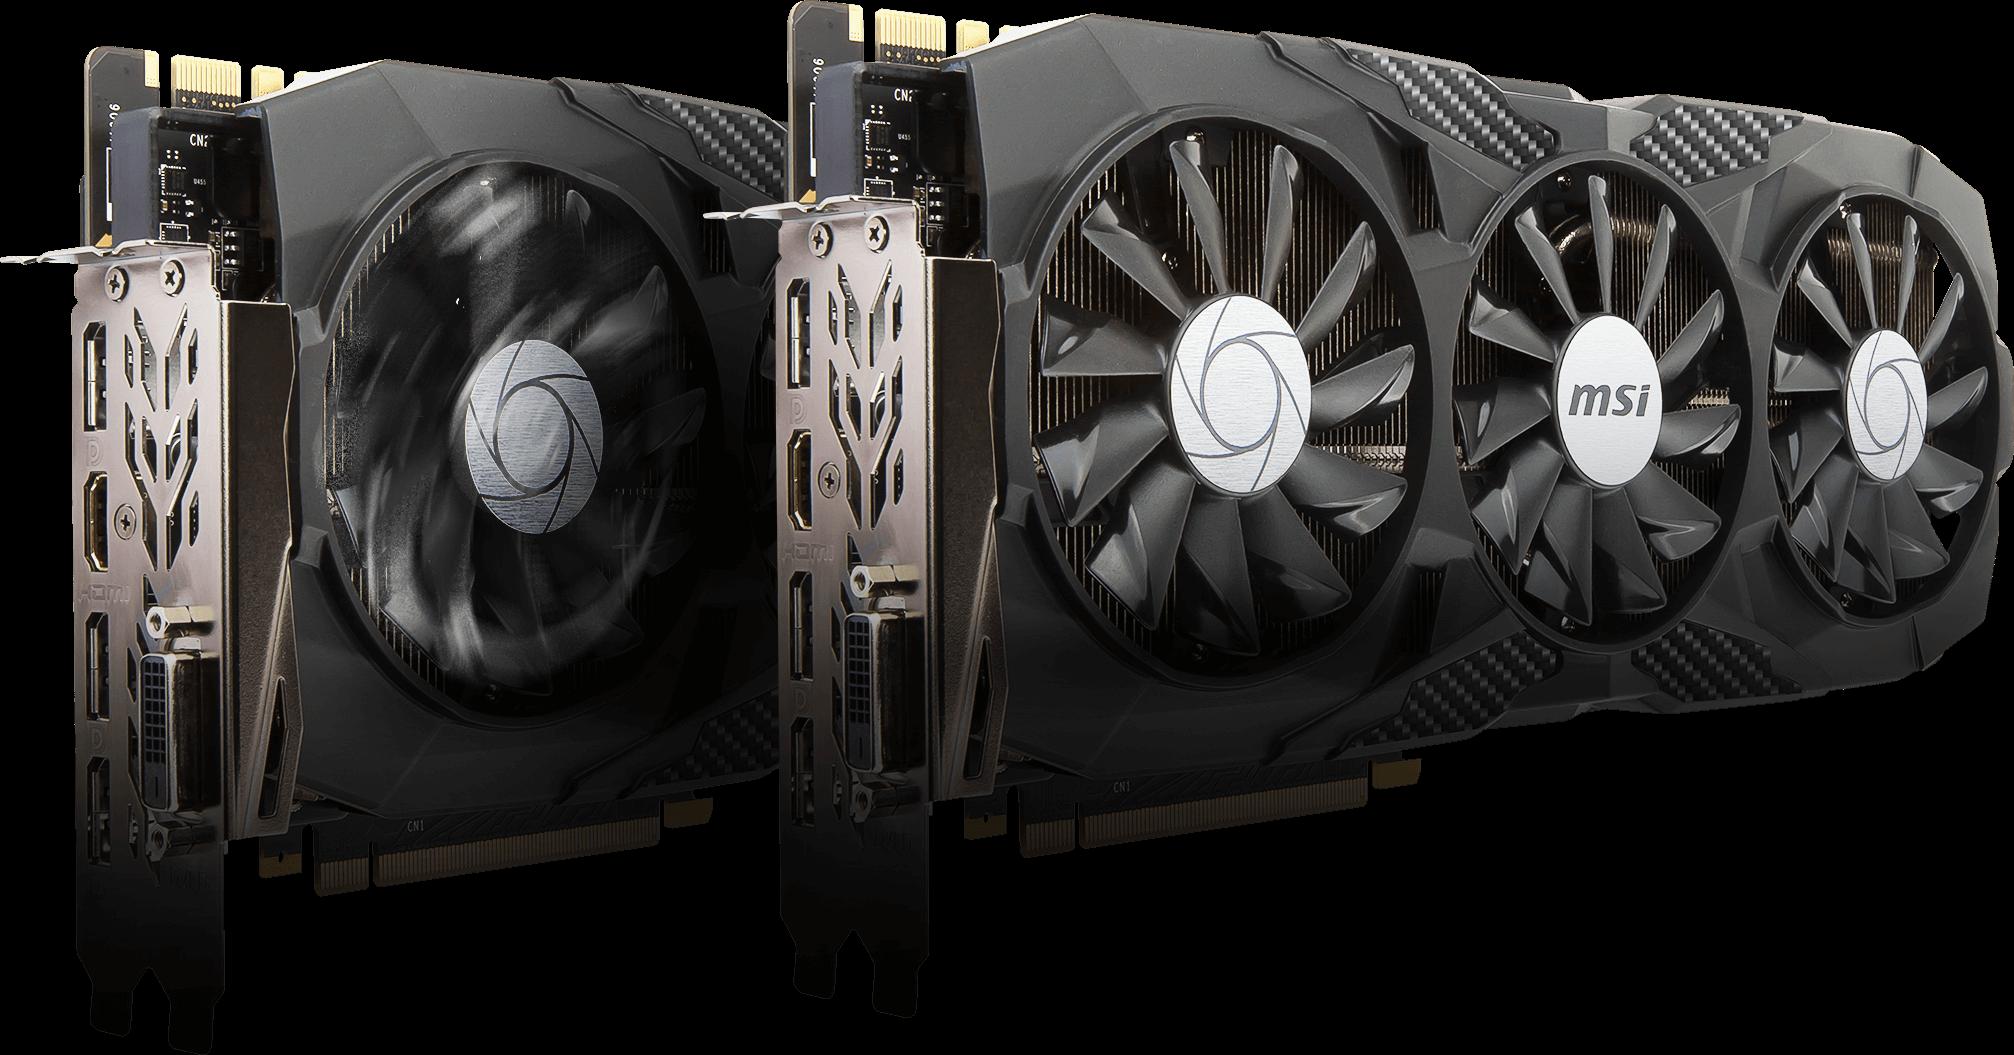 GeForce GTX 1070 Ti DUKE 8G | Graphics card - The world leader in